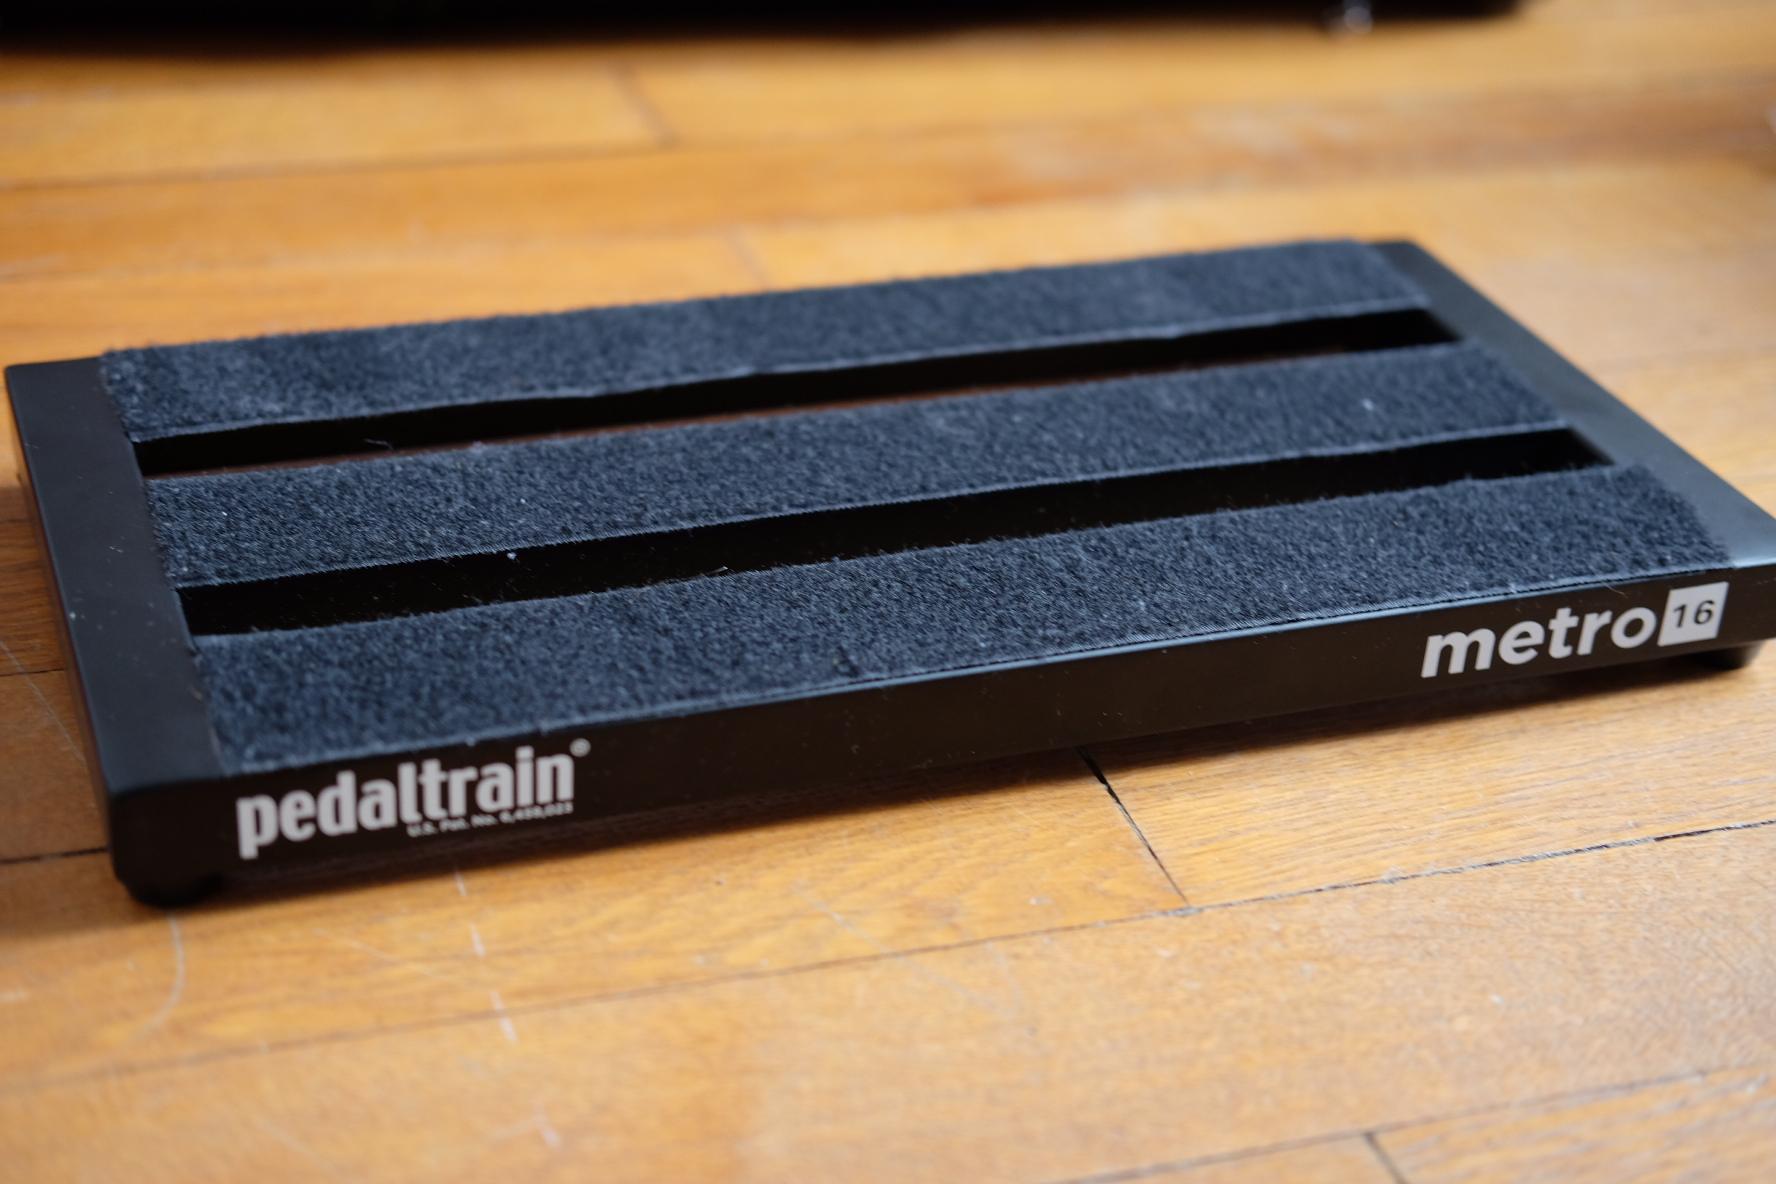 pedaltrain metro 16 image 1711191 audiofanzine. Black Bedroom Furniture Sets. Home Design Ideas